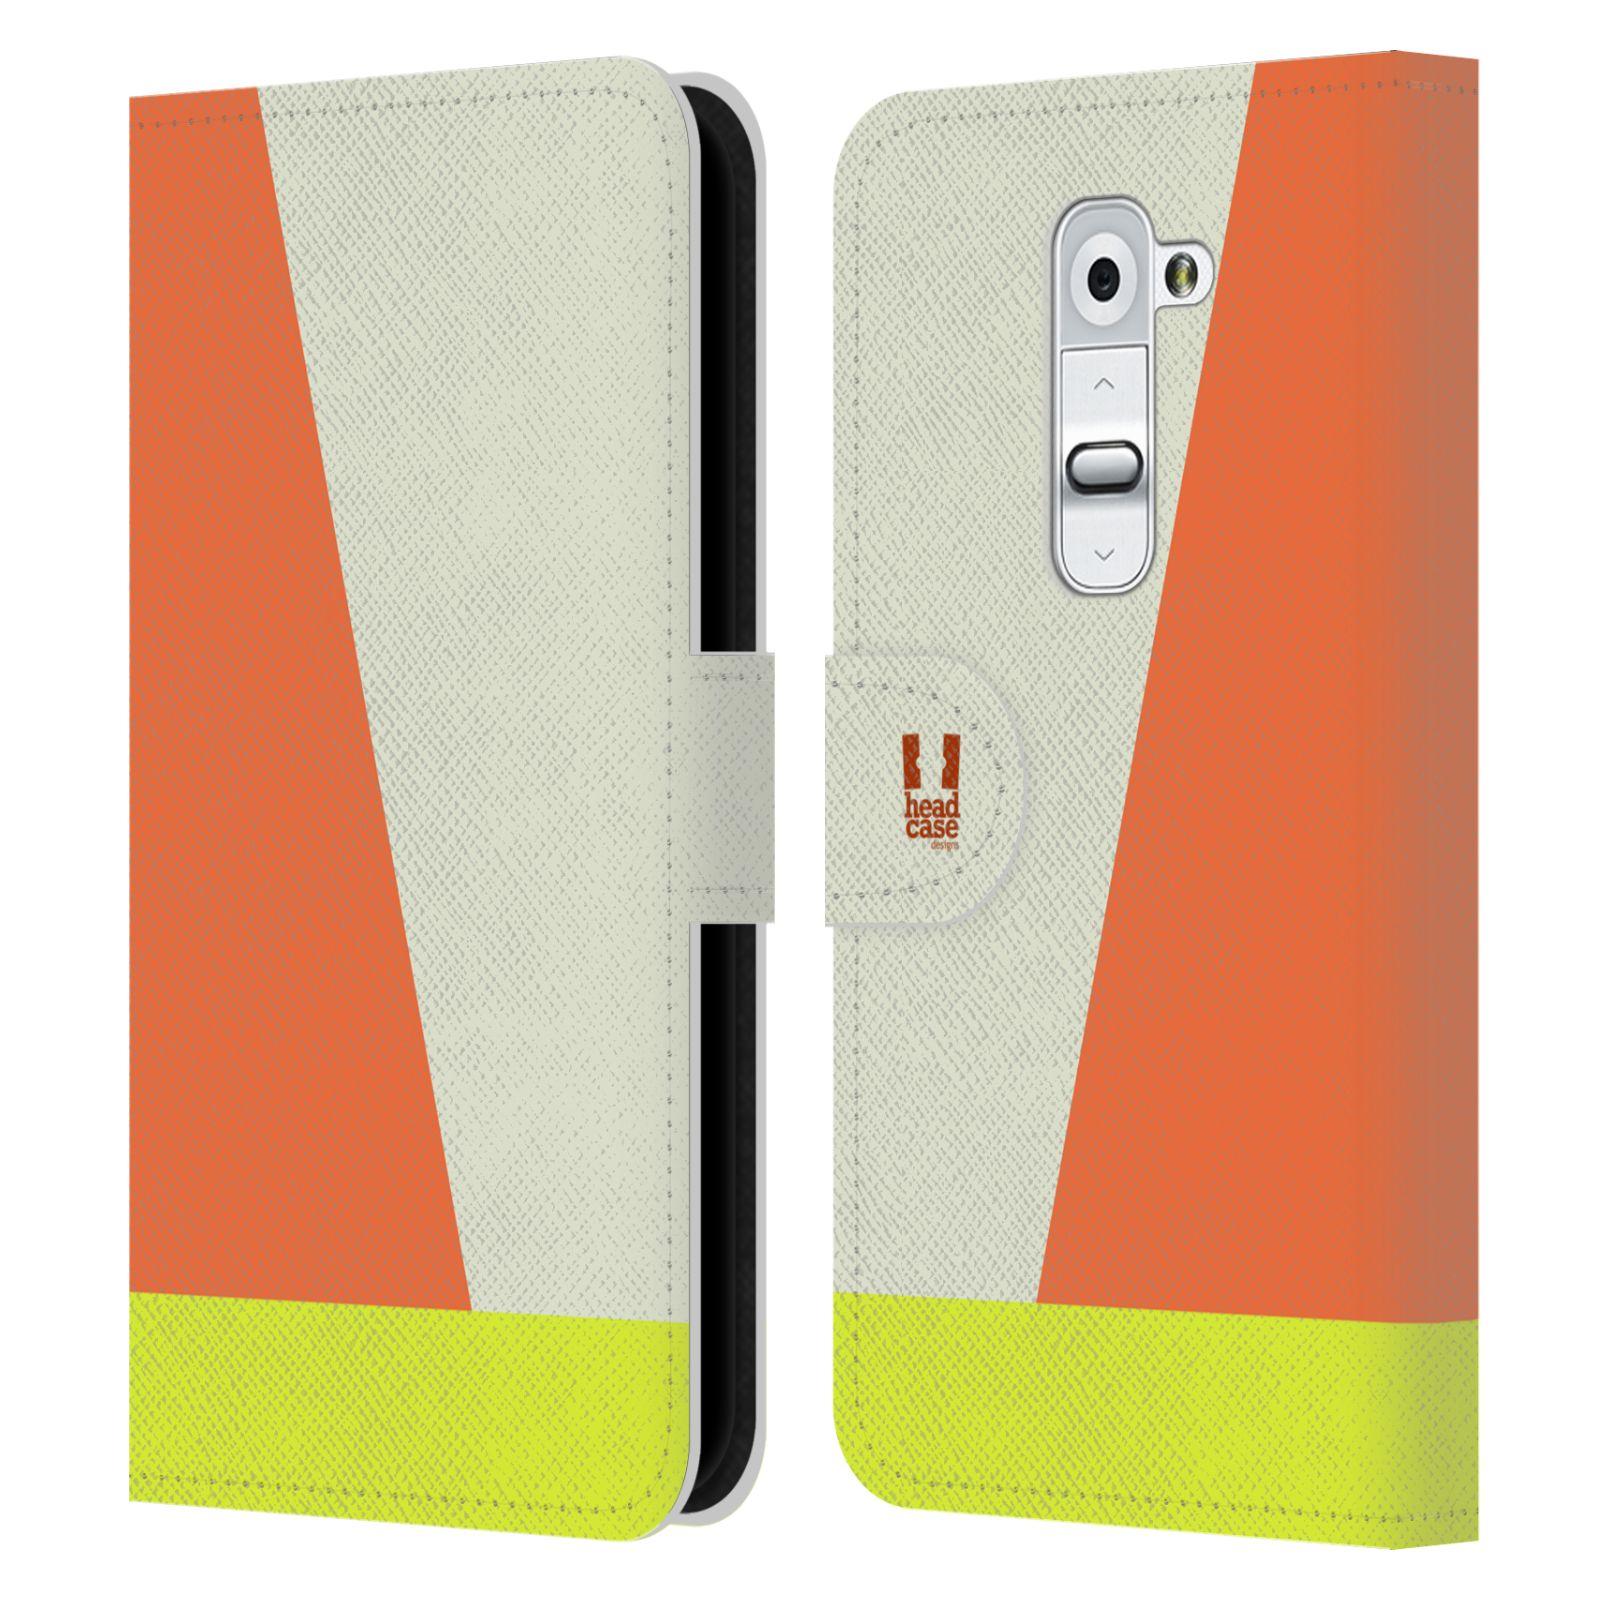 HEAD CASE Flipové pouzdro pro mobil LG G2 barevné tvary slonová kost